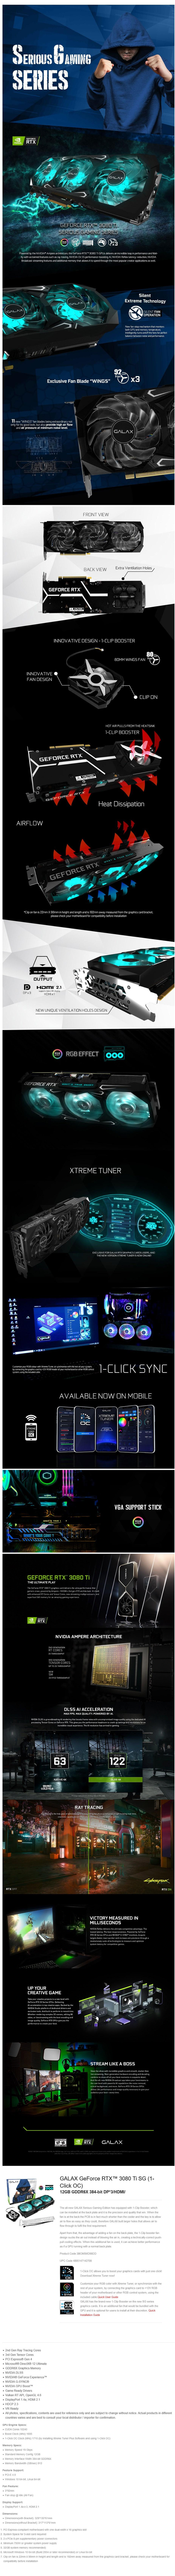 GALAX GeForce RTX 3080 Ti SG 1-Click OC 12GB Video Card - Desktop Overview 1